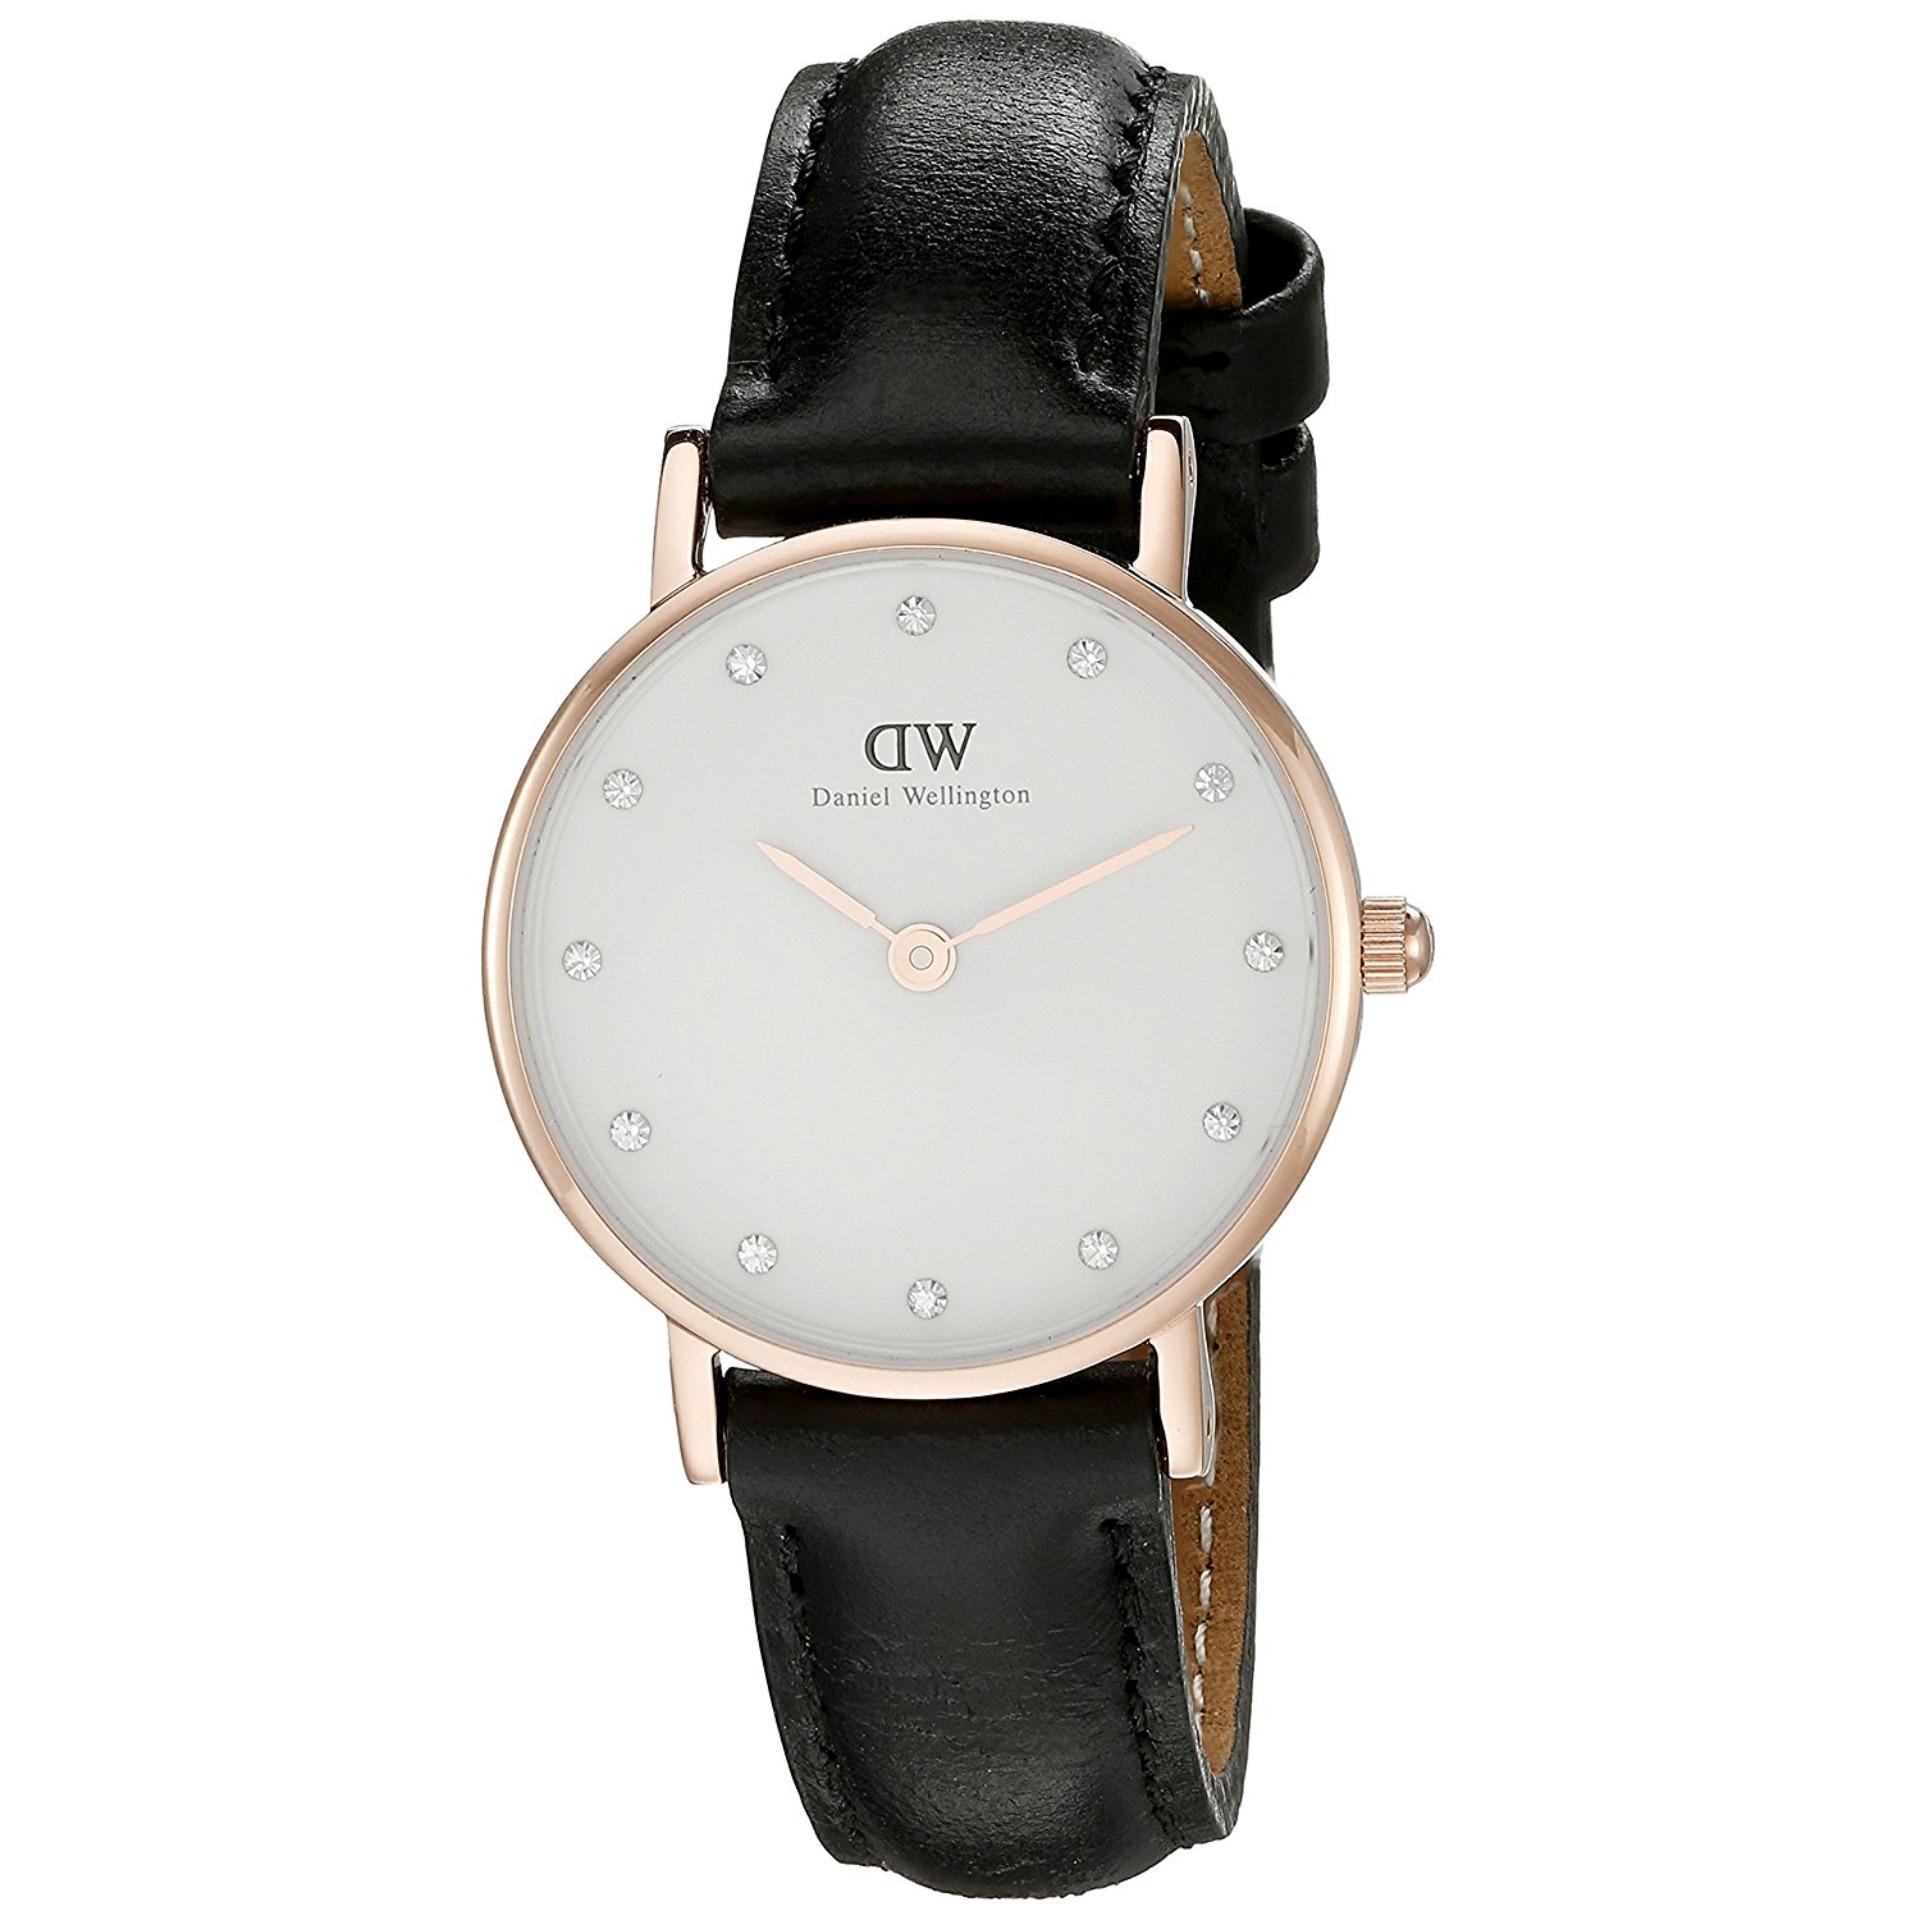 cb13109a1ccb Daniel Wellington Classy Sheffield White Diamond Dial Ladies Quartz 26mm  Black Leather Watch DW00100060